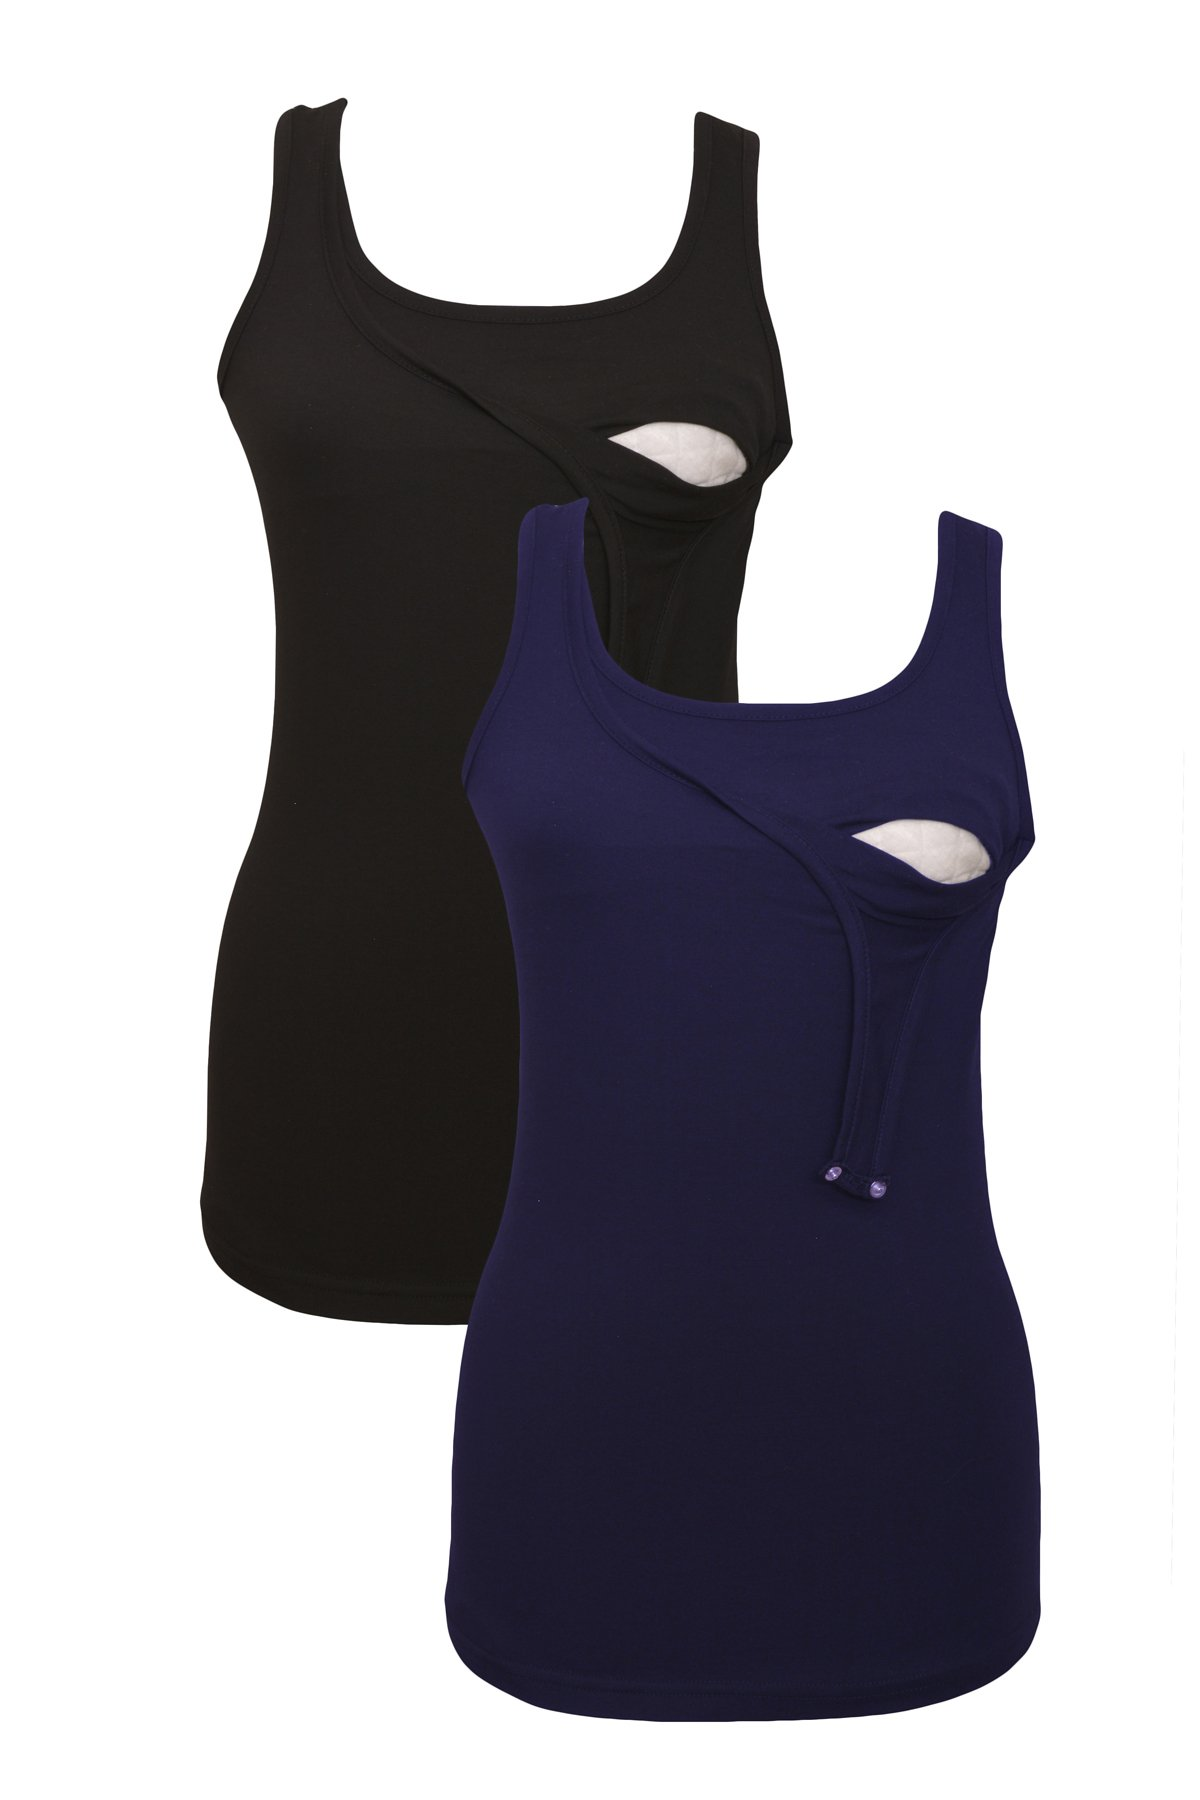 100% premium Cotton - Women Nursing Maternity Tank Top 2 piece Set